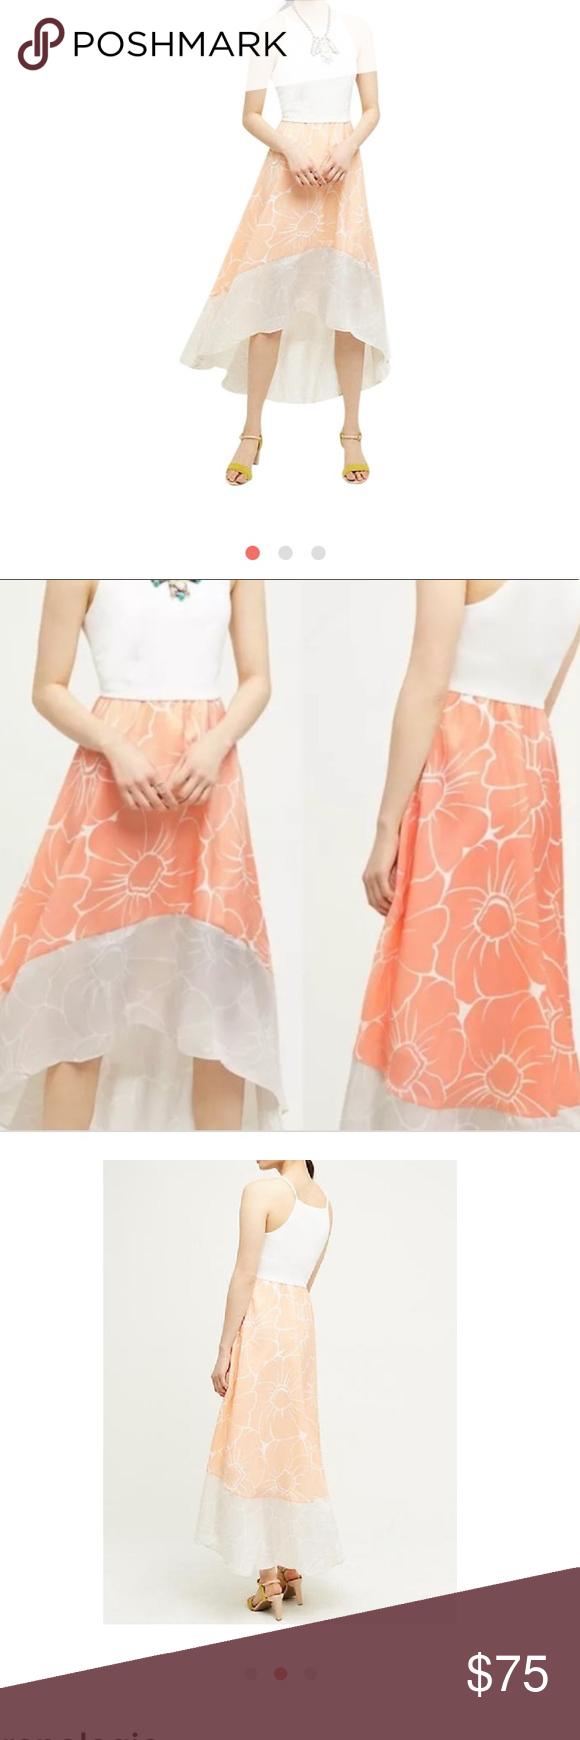 bdb8776650f0 Anthropologie hutch dress High low peachy hutch Anthropologie dress size  medium Anthropologie Dresses Maxi